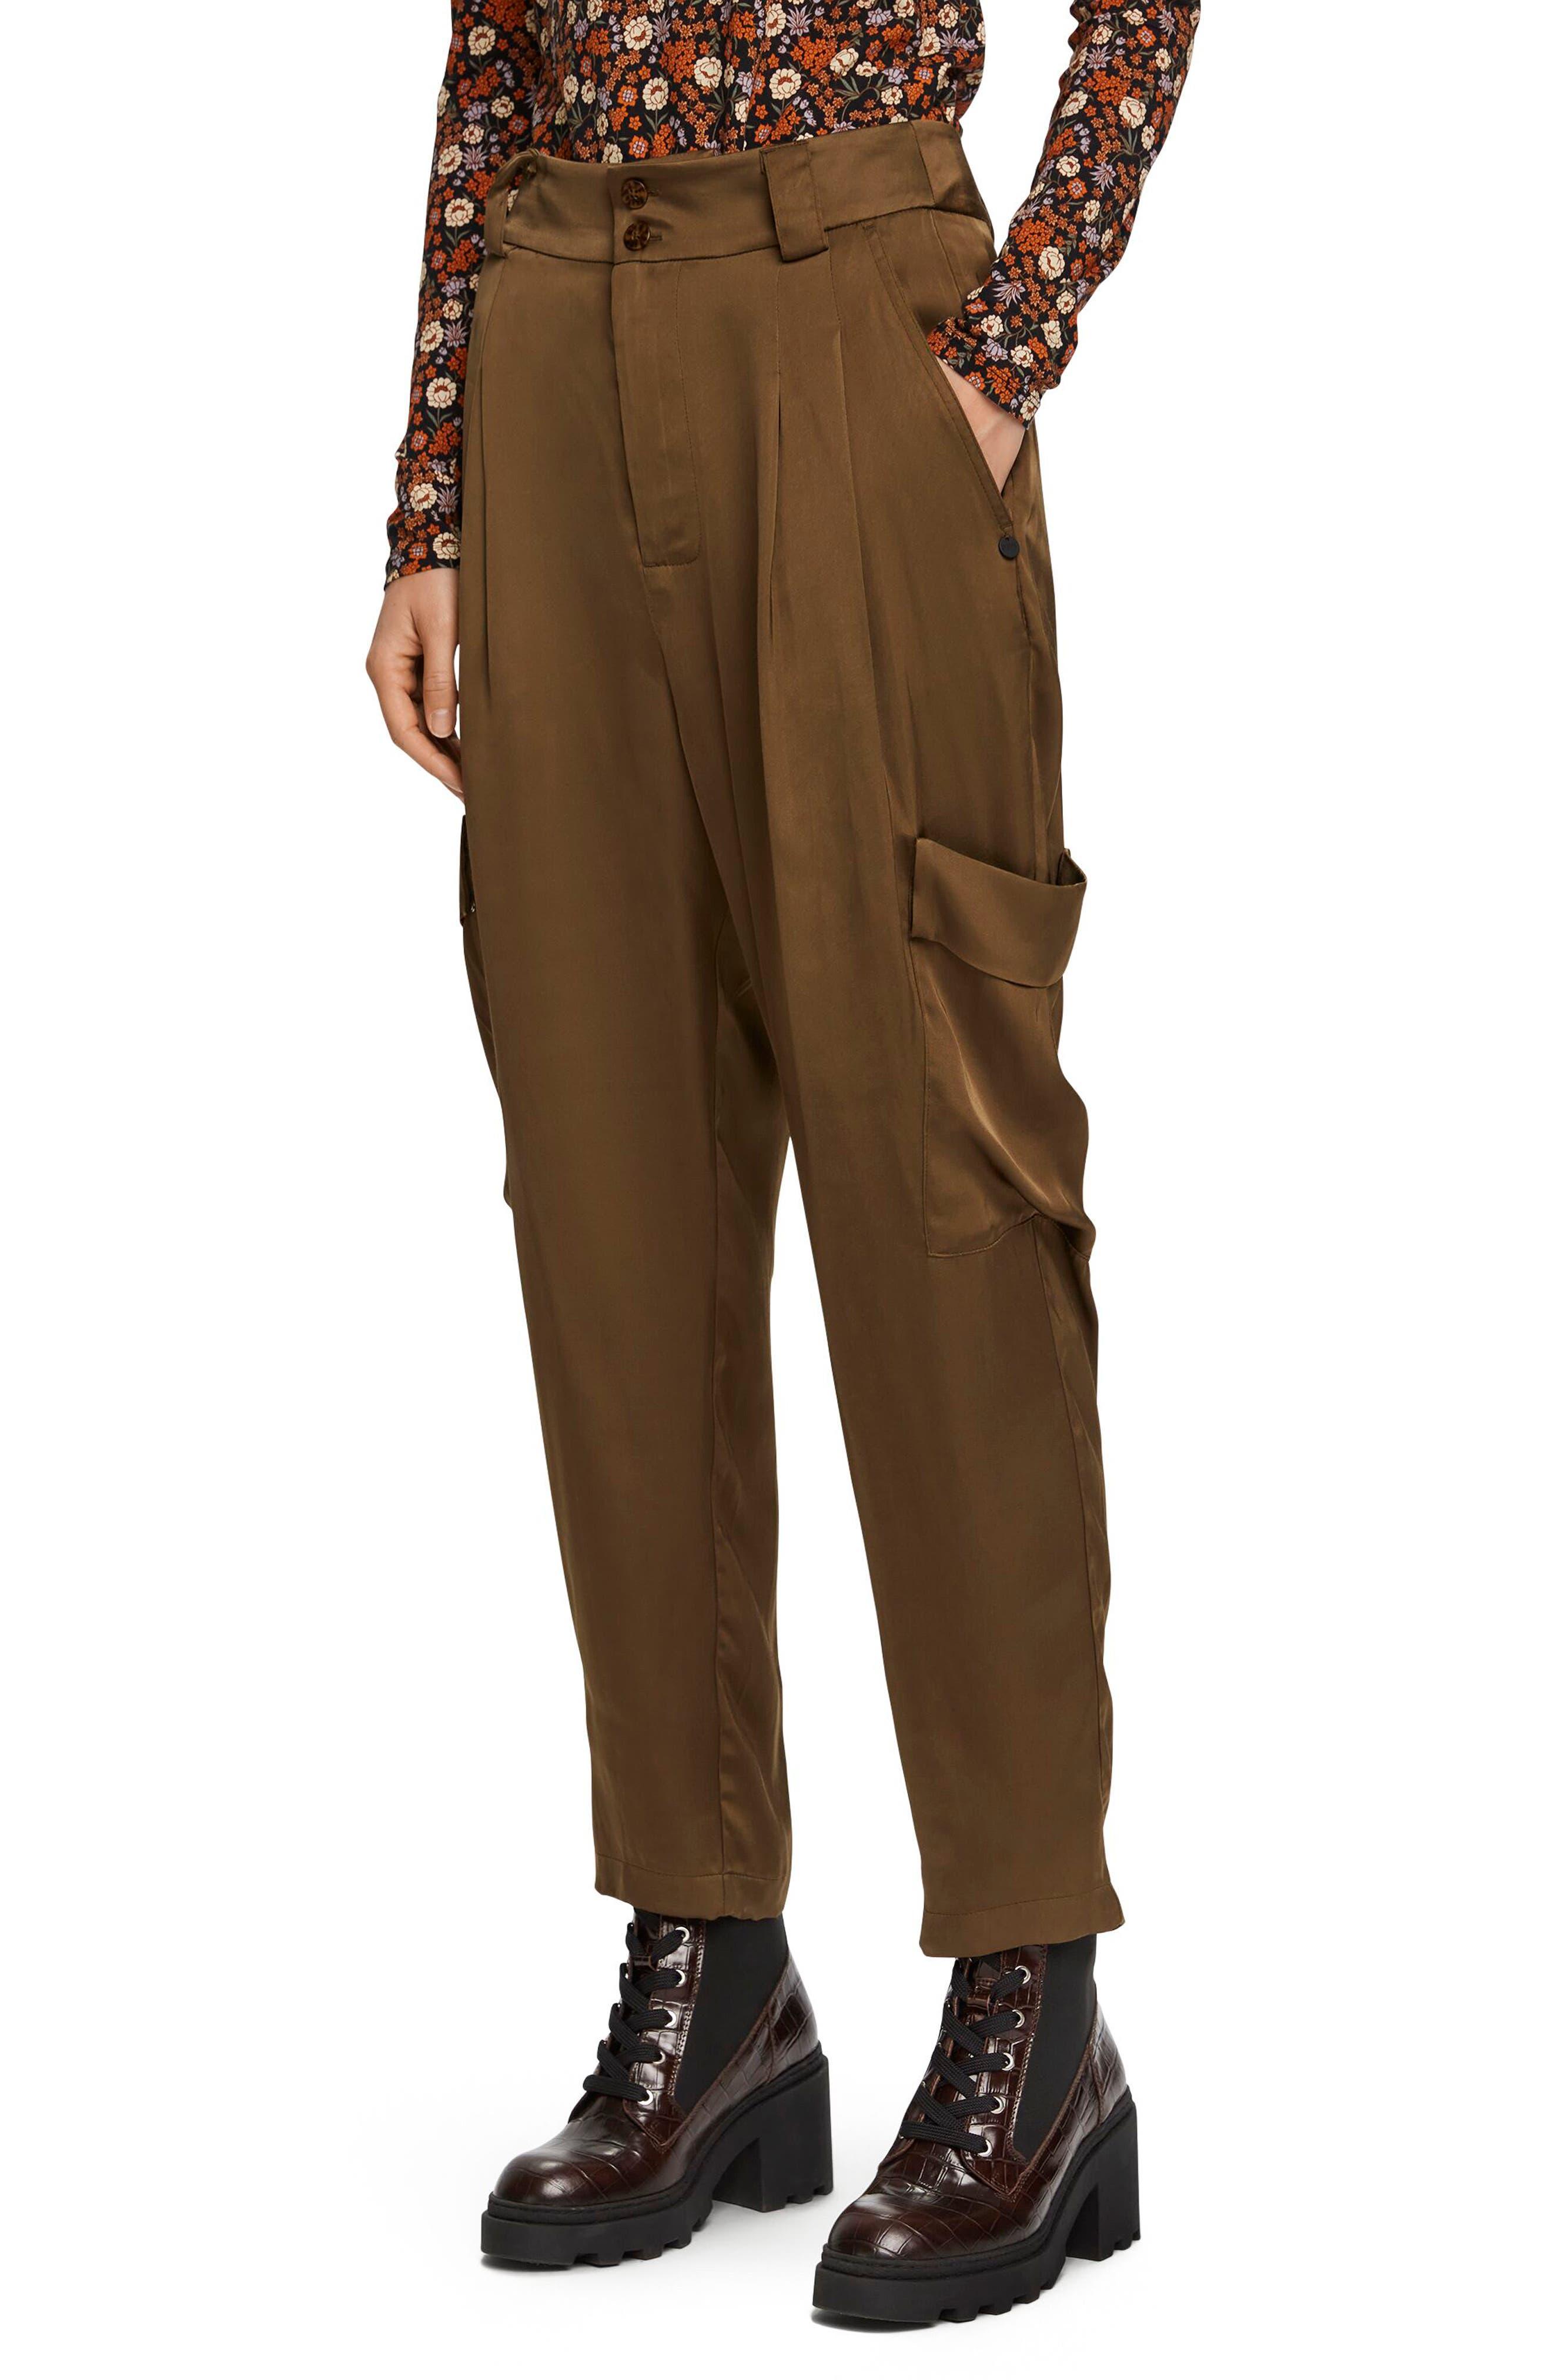 Scotch & Soda Chic Drapey Cargo Pants | Nordstrom